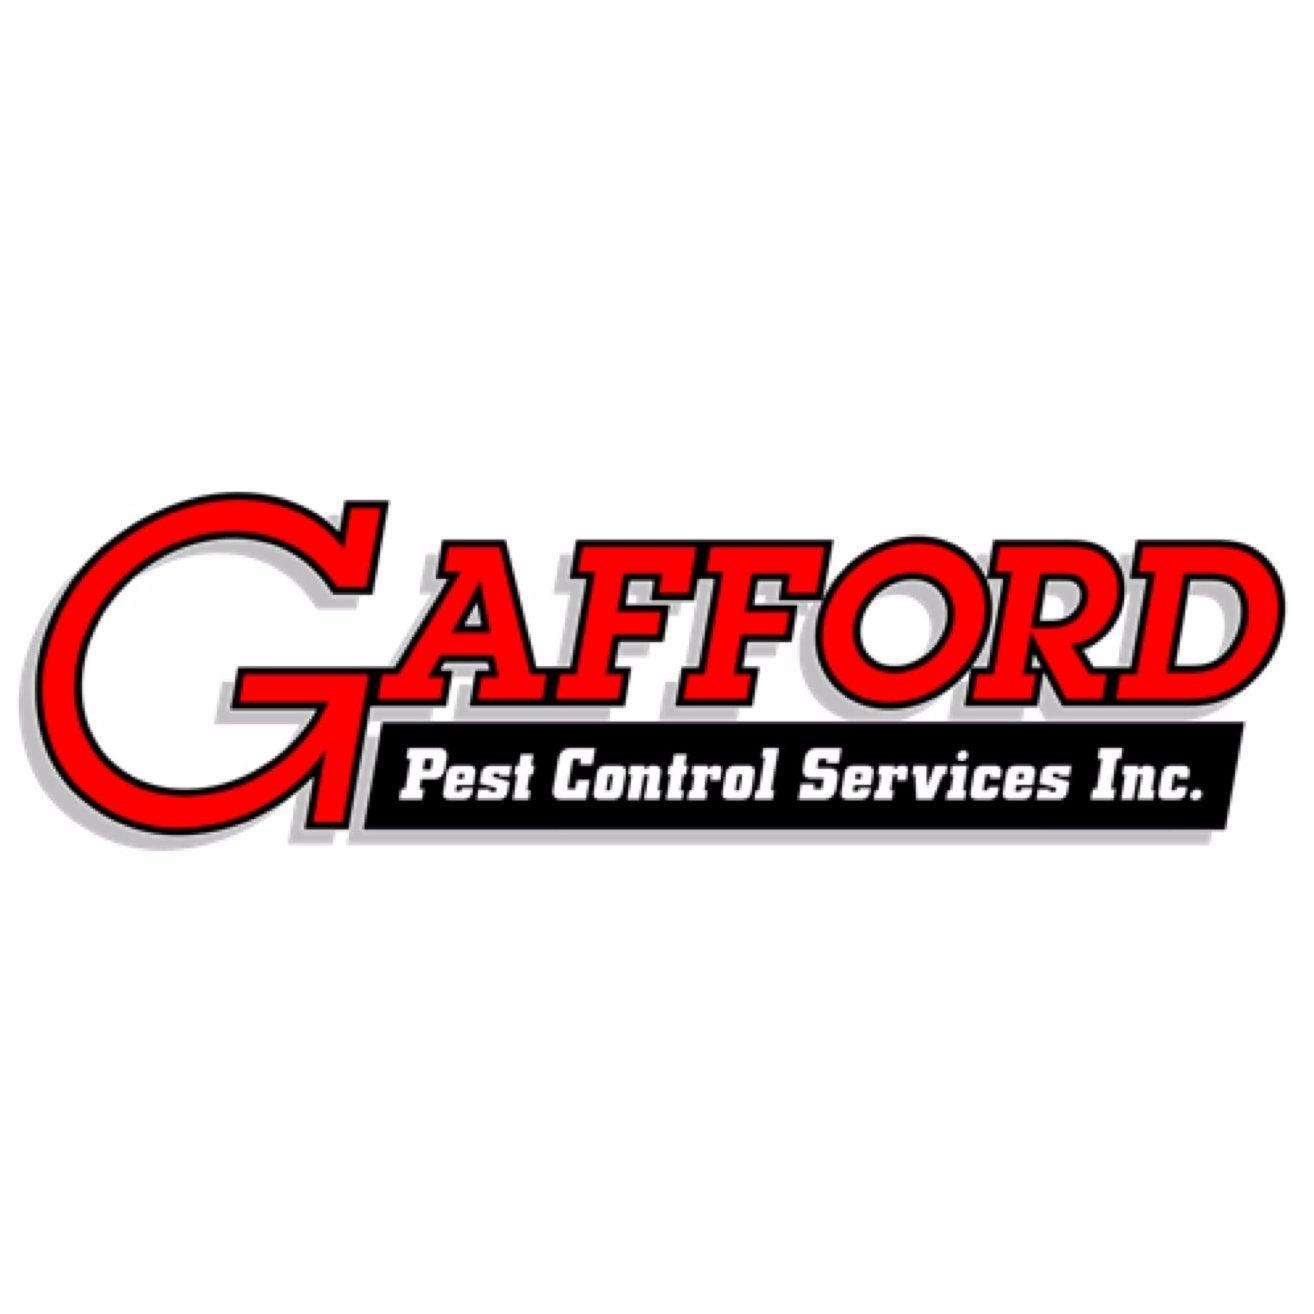 Gafford Pest Control Services